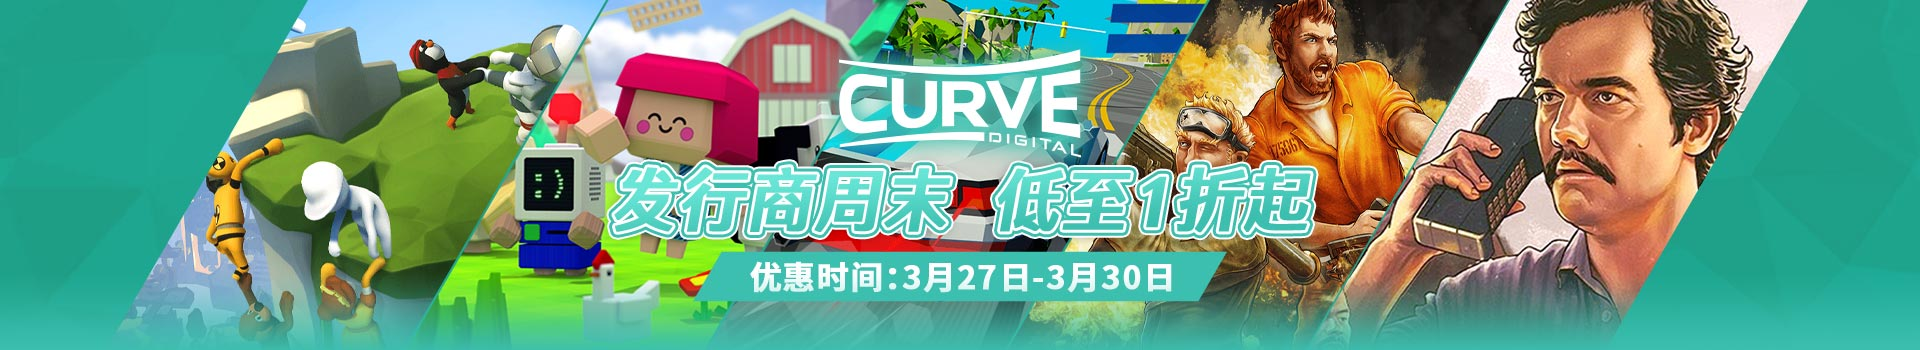 Curve Digital 专区